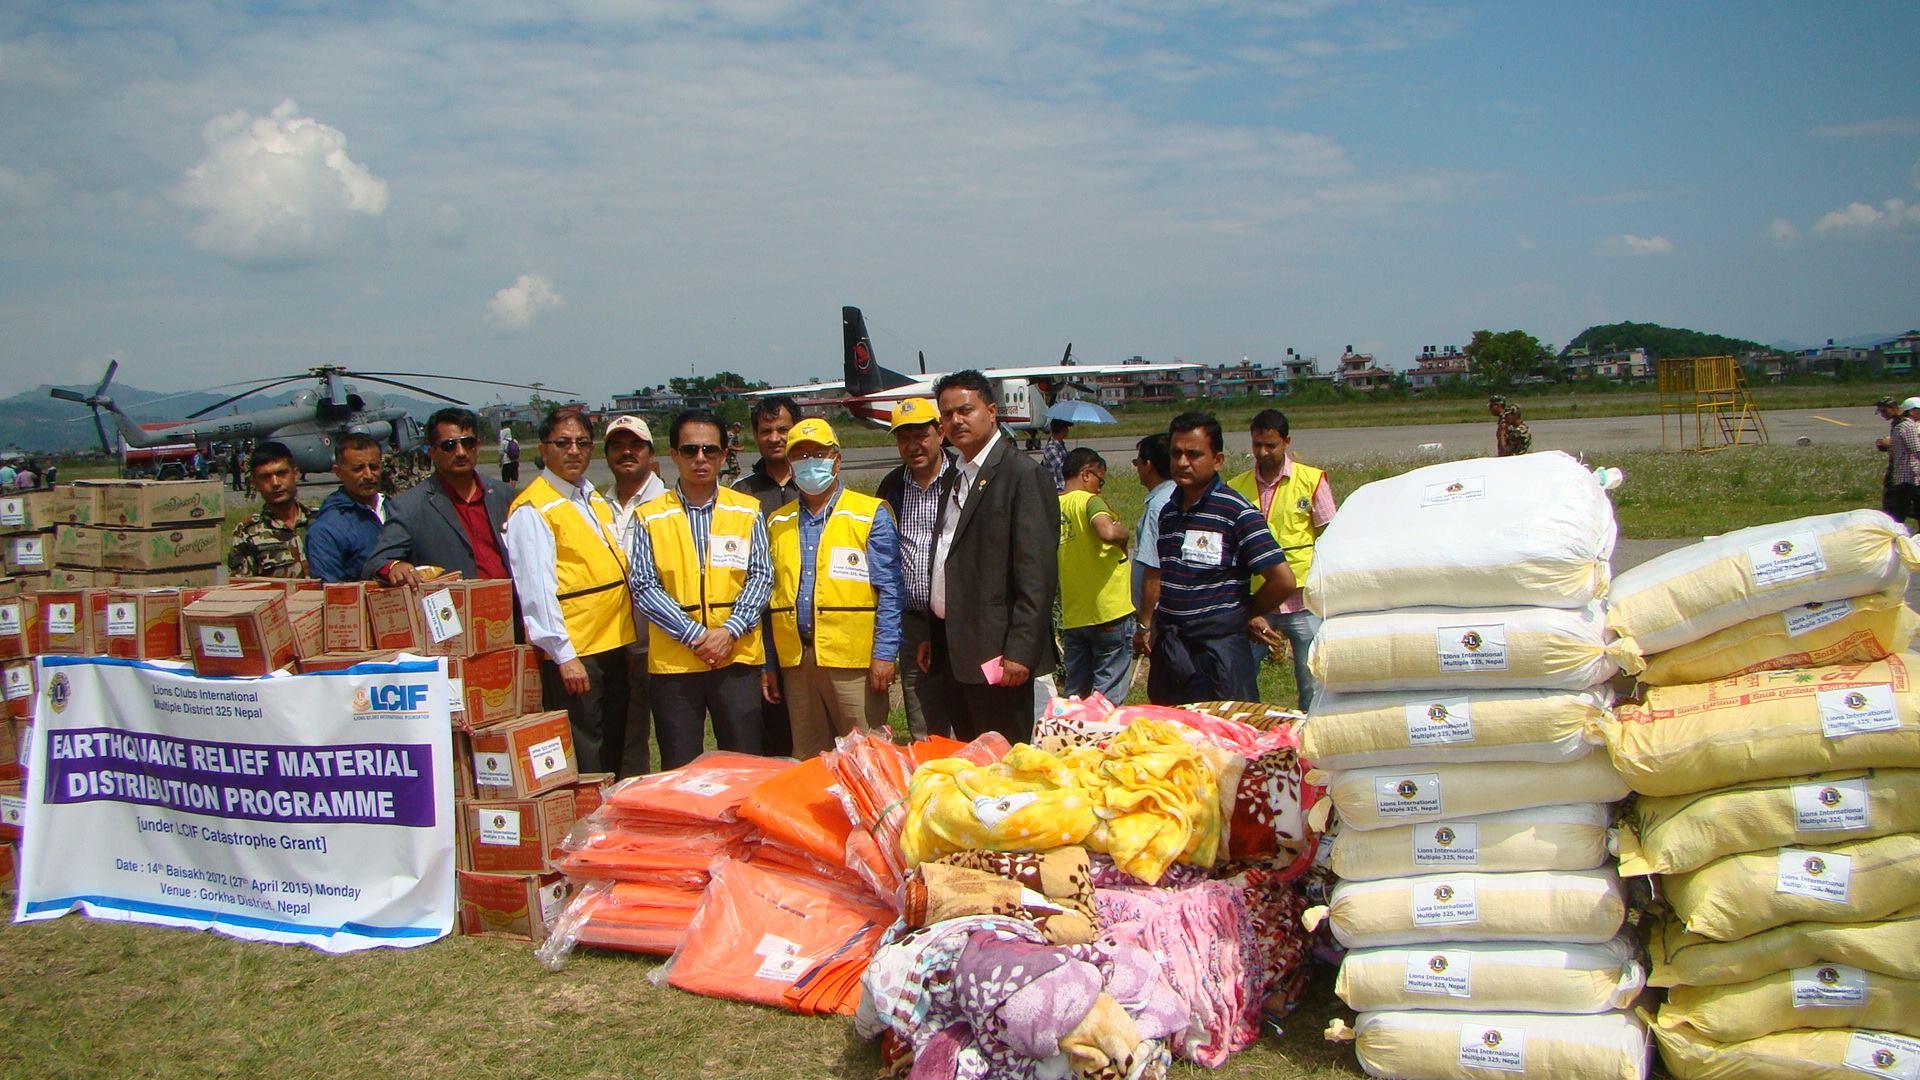 Tibet Matters: Emergency relief to help Tibetan families in Bagang, Nepal